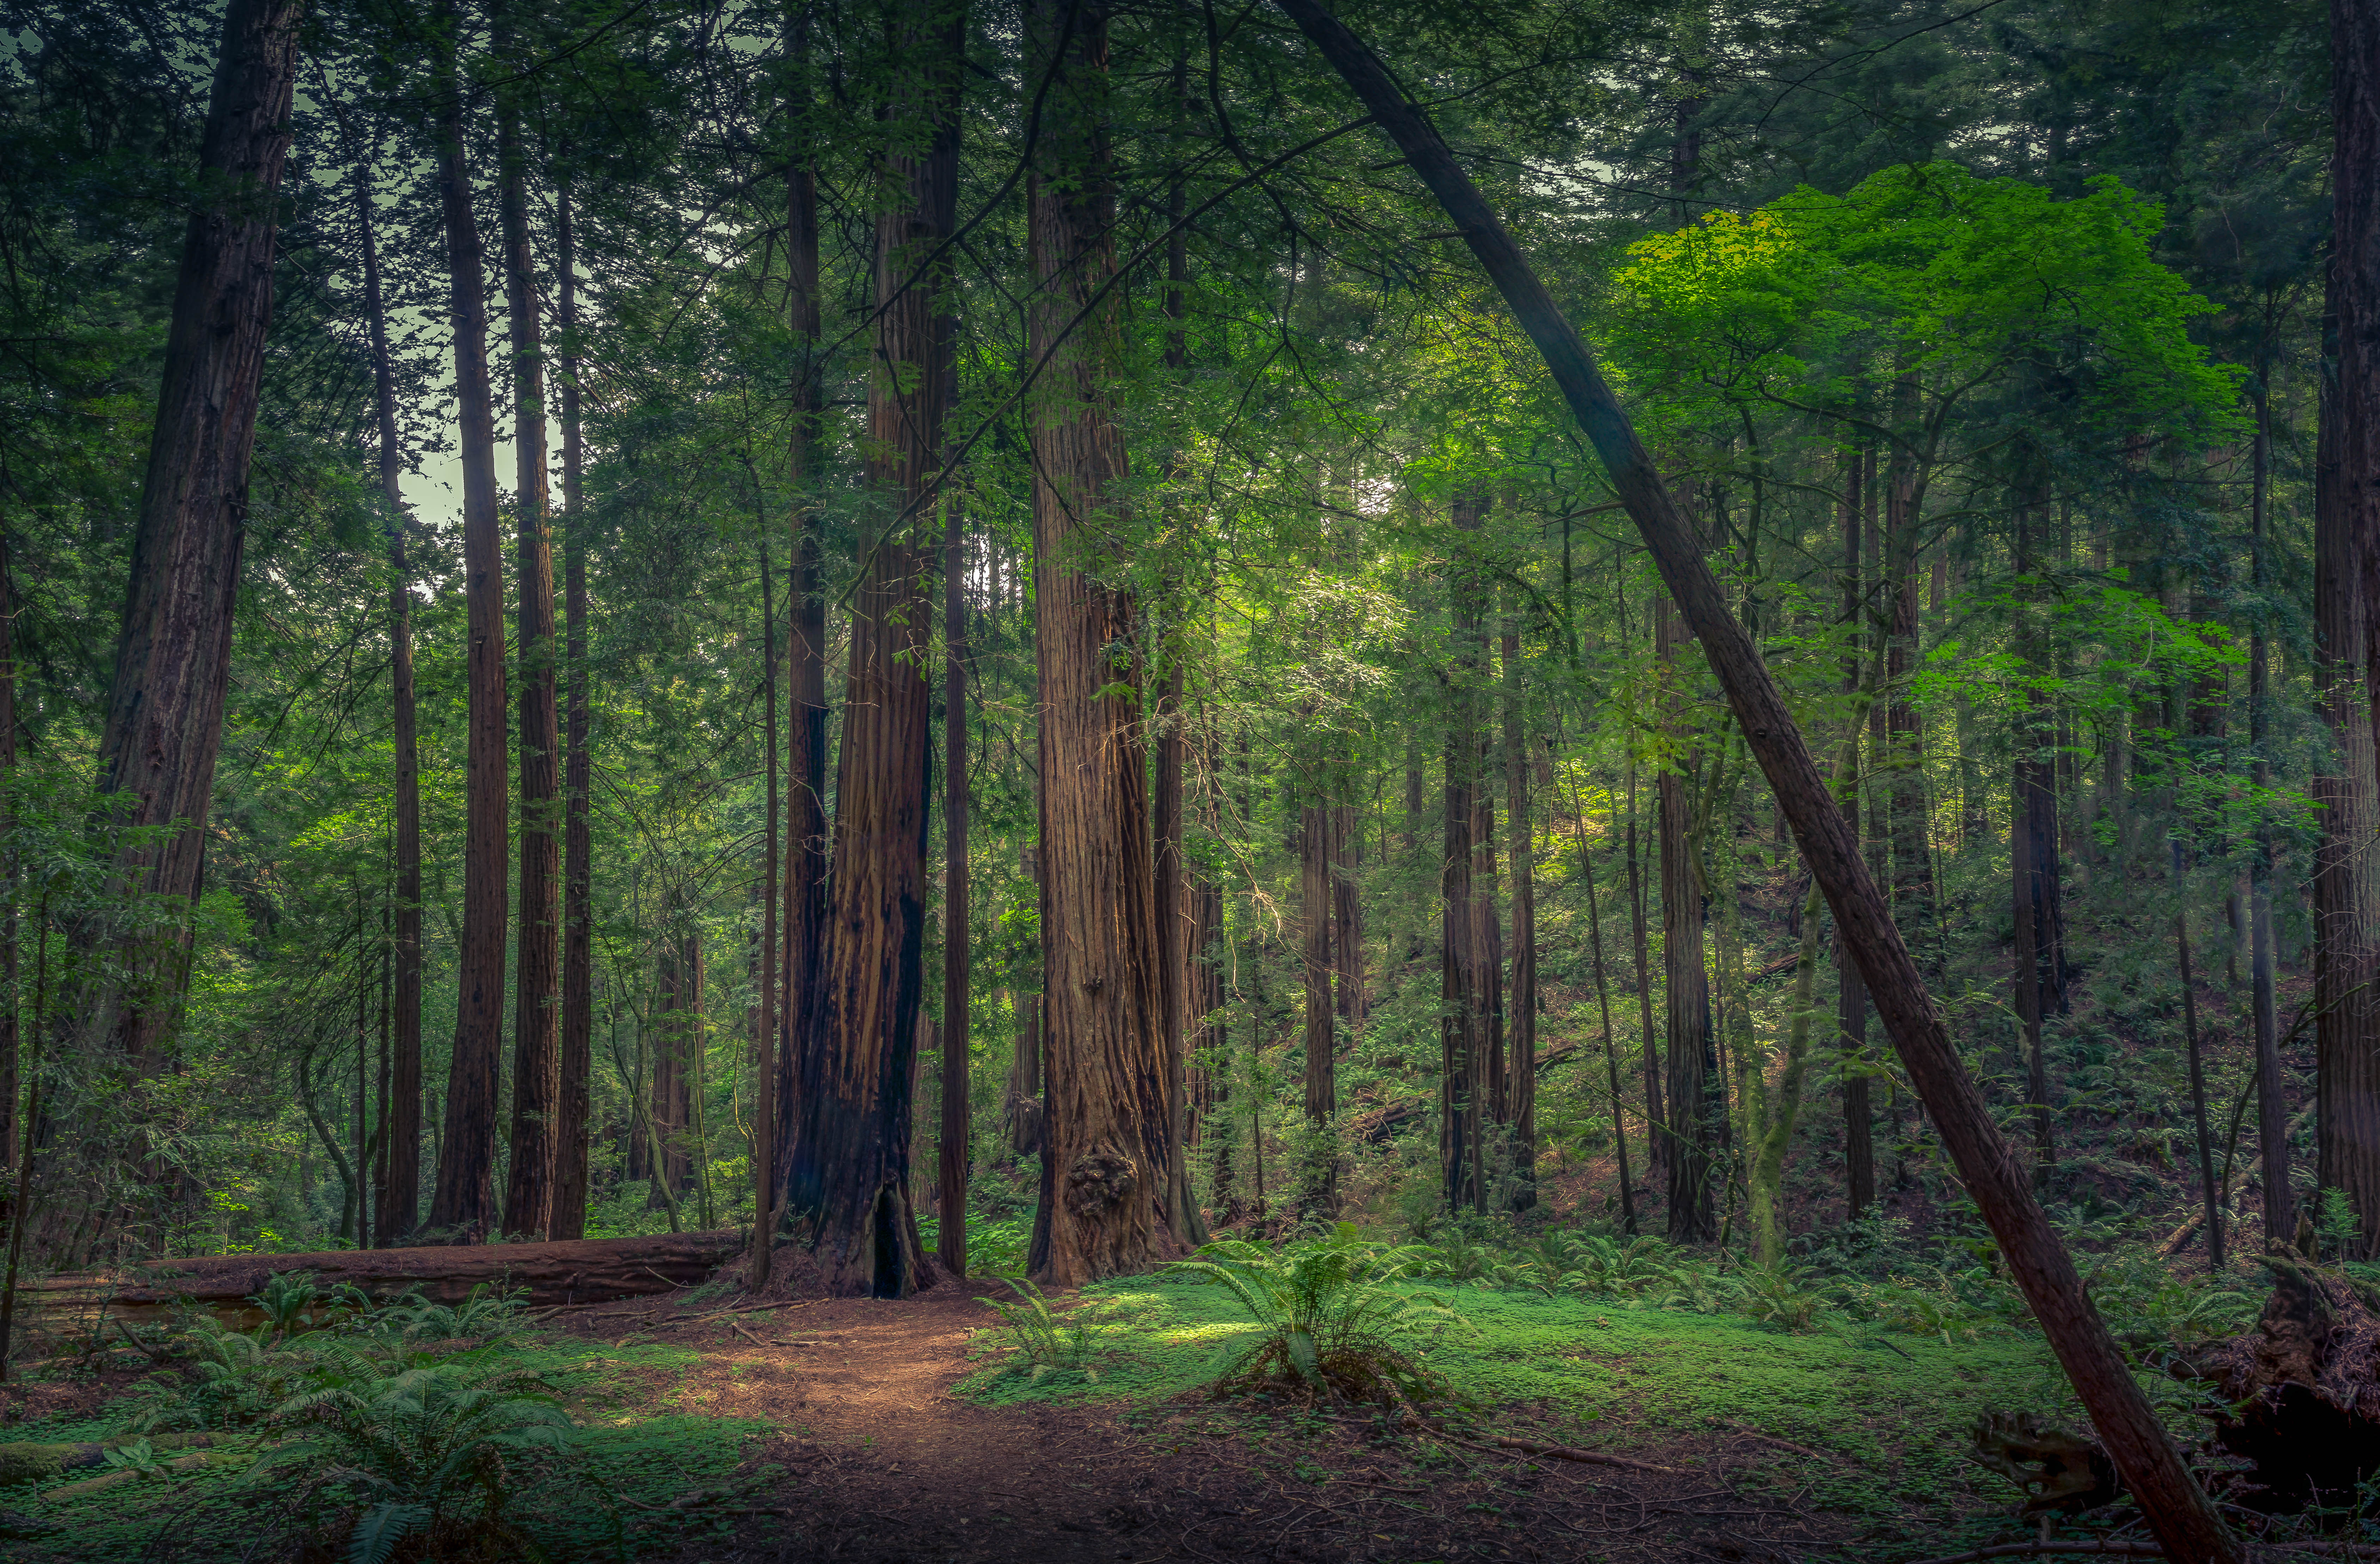 сторис фото леса для смартфона прессе среди